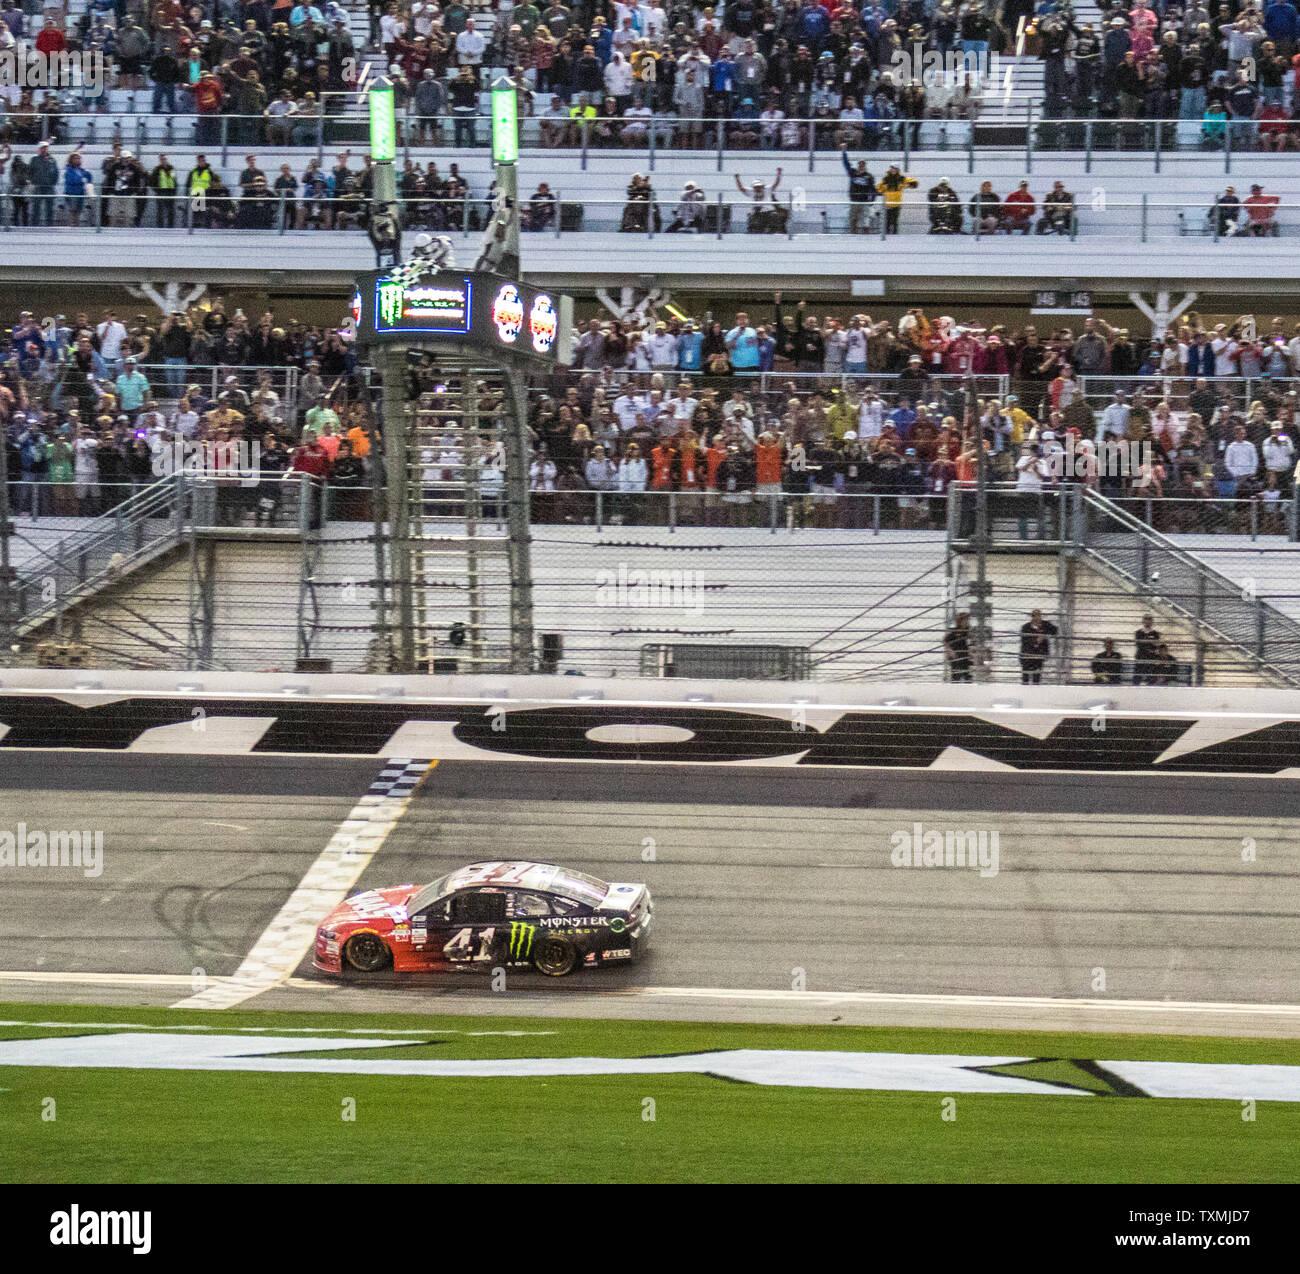 Kurt Busch Crosses The Finish Line To Win The 59th Daytona 500 On